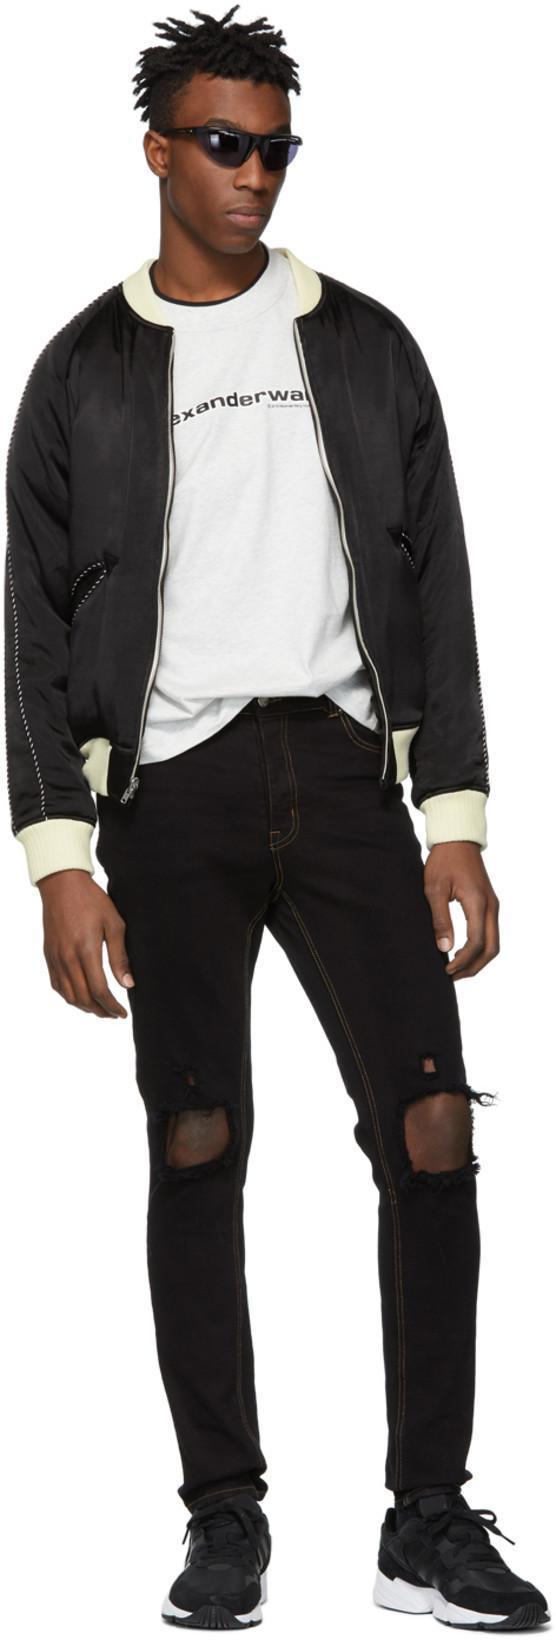 Polycarbonate Heron Tailwind Preston Nike Sunglasses With EwtwrBRq